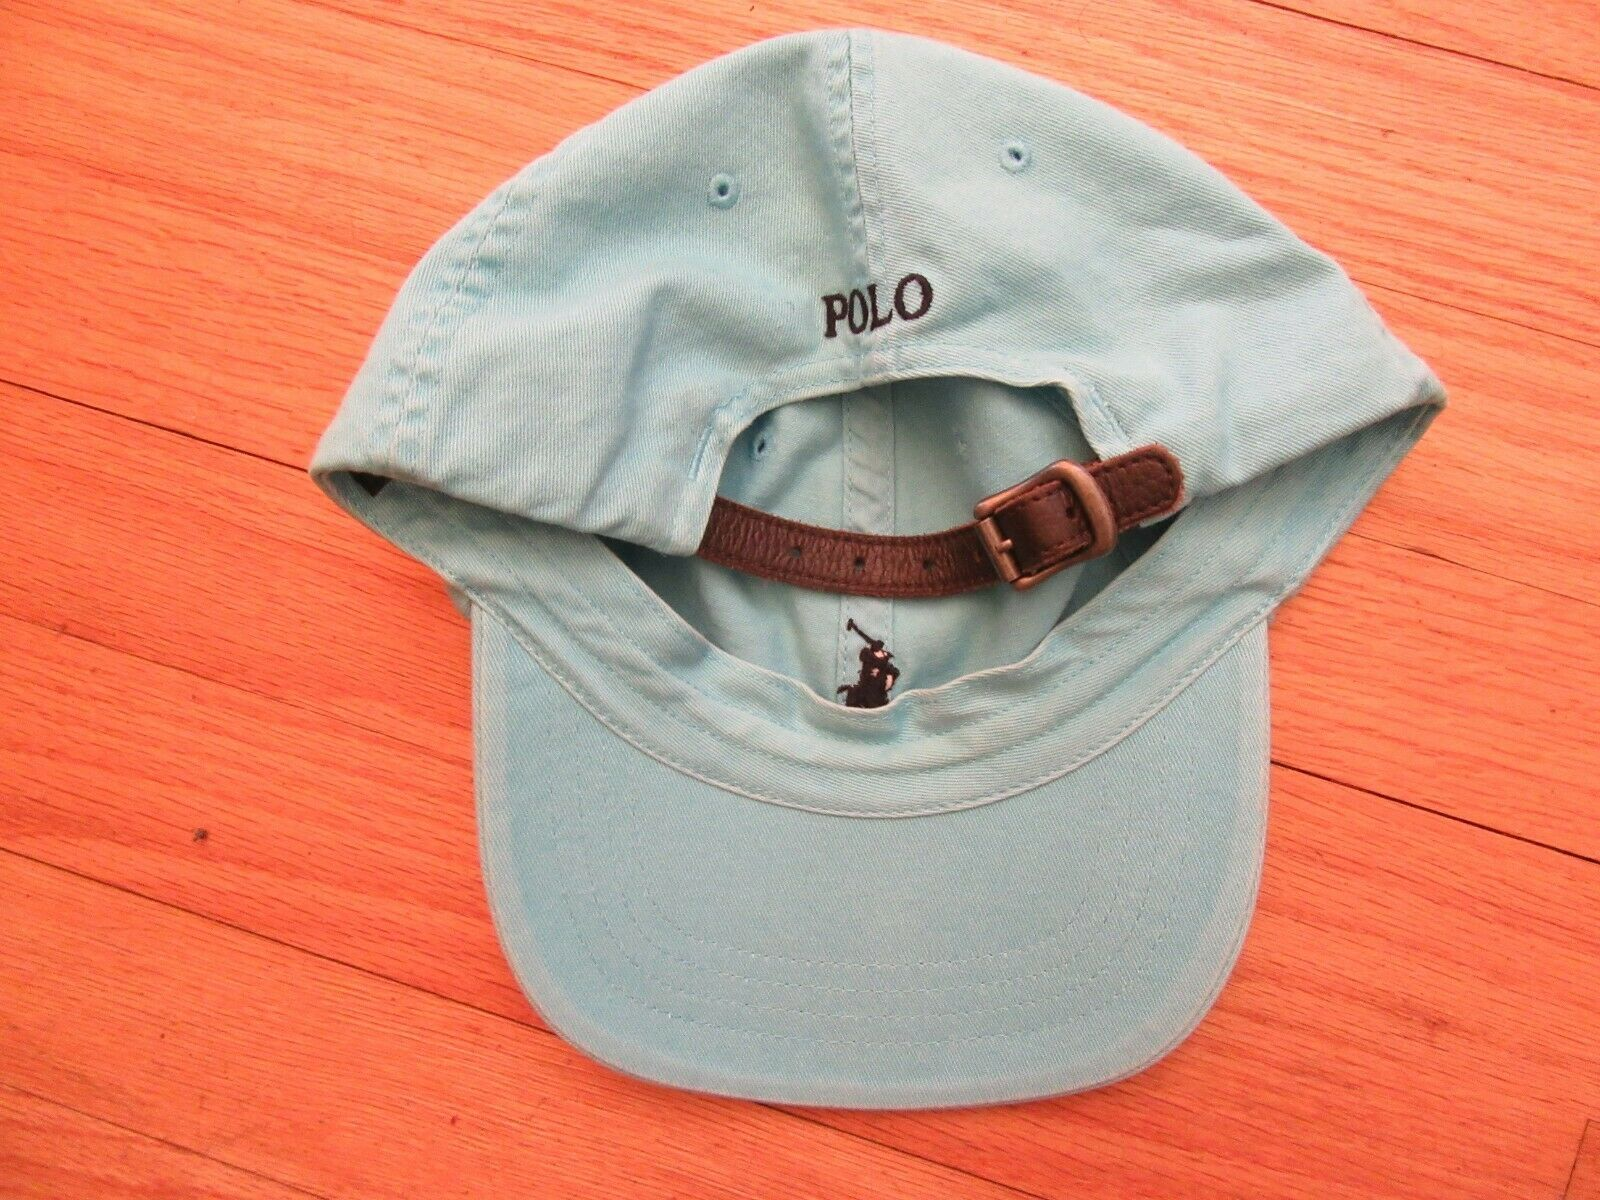 95608c19 10G/POLO RALPH LAUREN BLUE BASEBALL CAP/ADJUSTABLE/LEATHER STRAP/PONY!